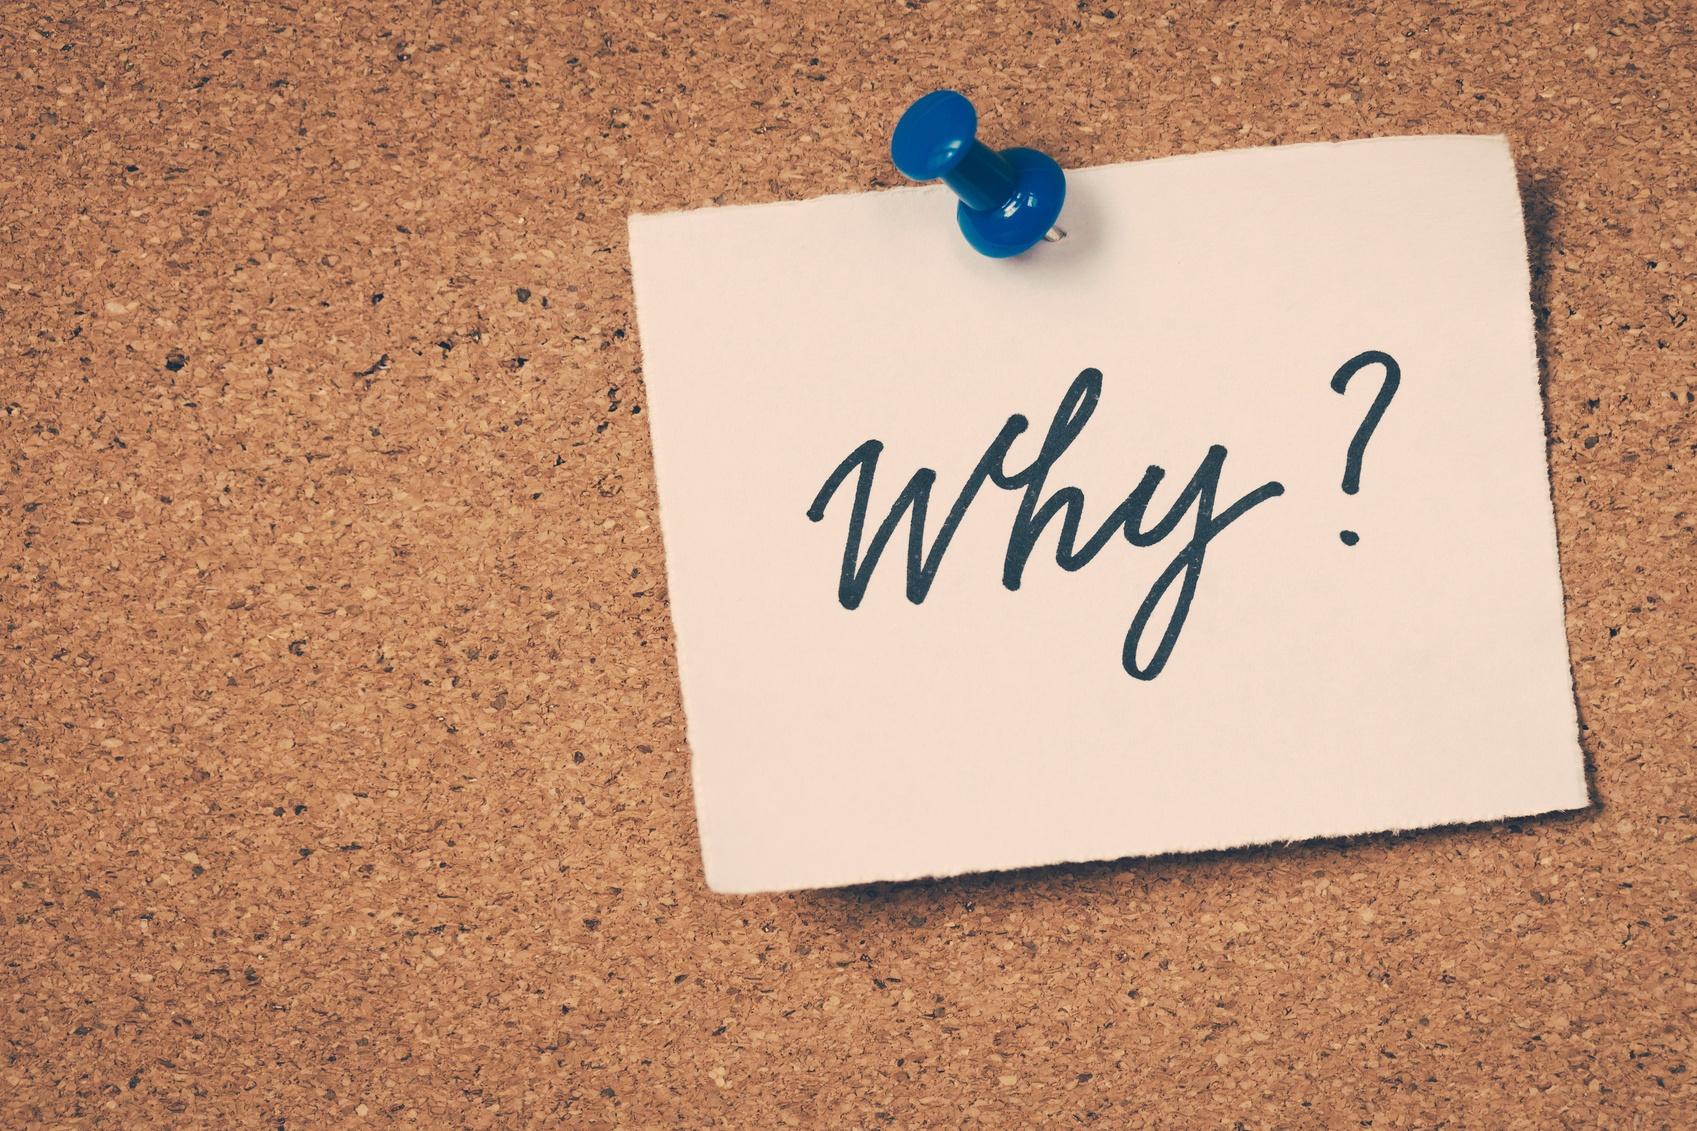 defining-supply-chain-metrics-why